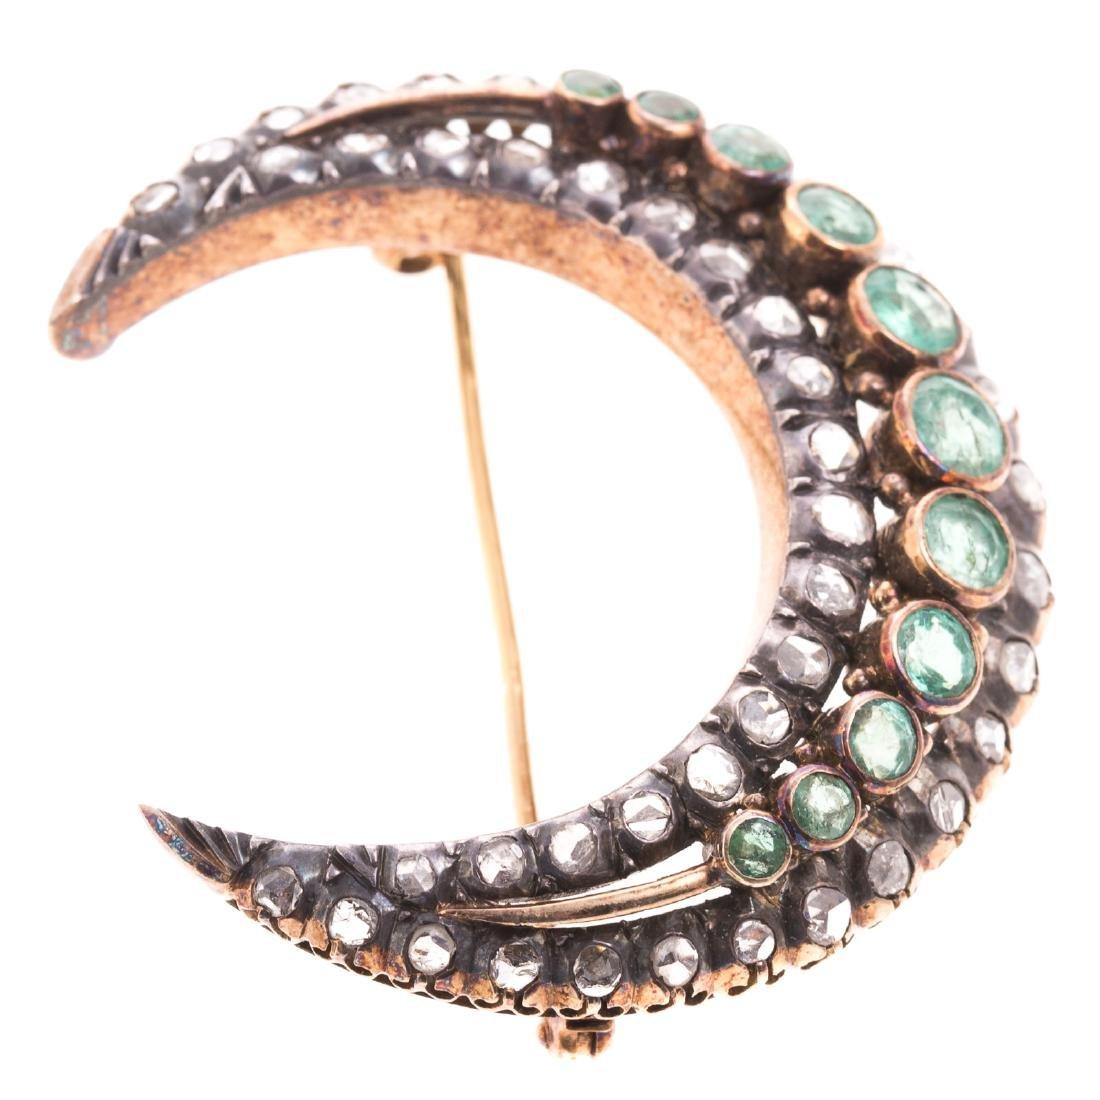 An Edwardian Emerald & Diamond Crescent Moon Pin - 3